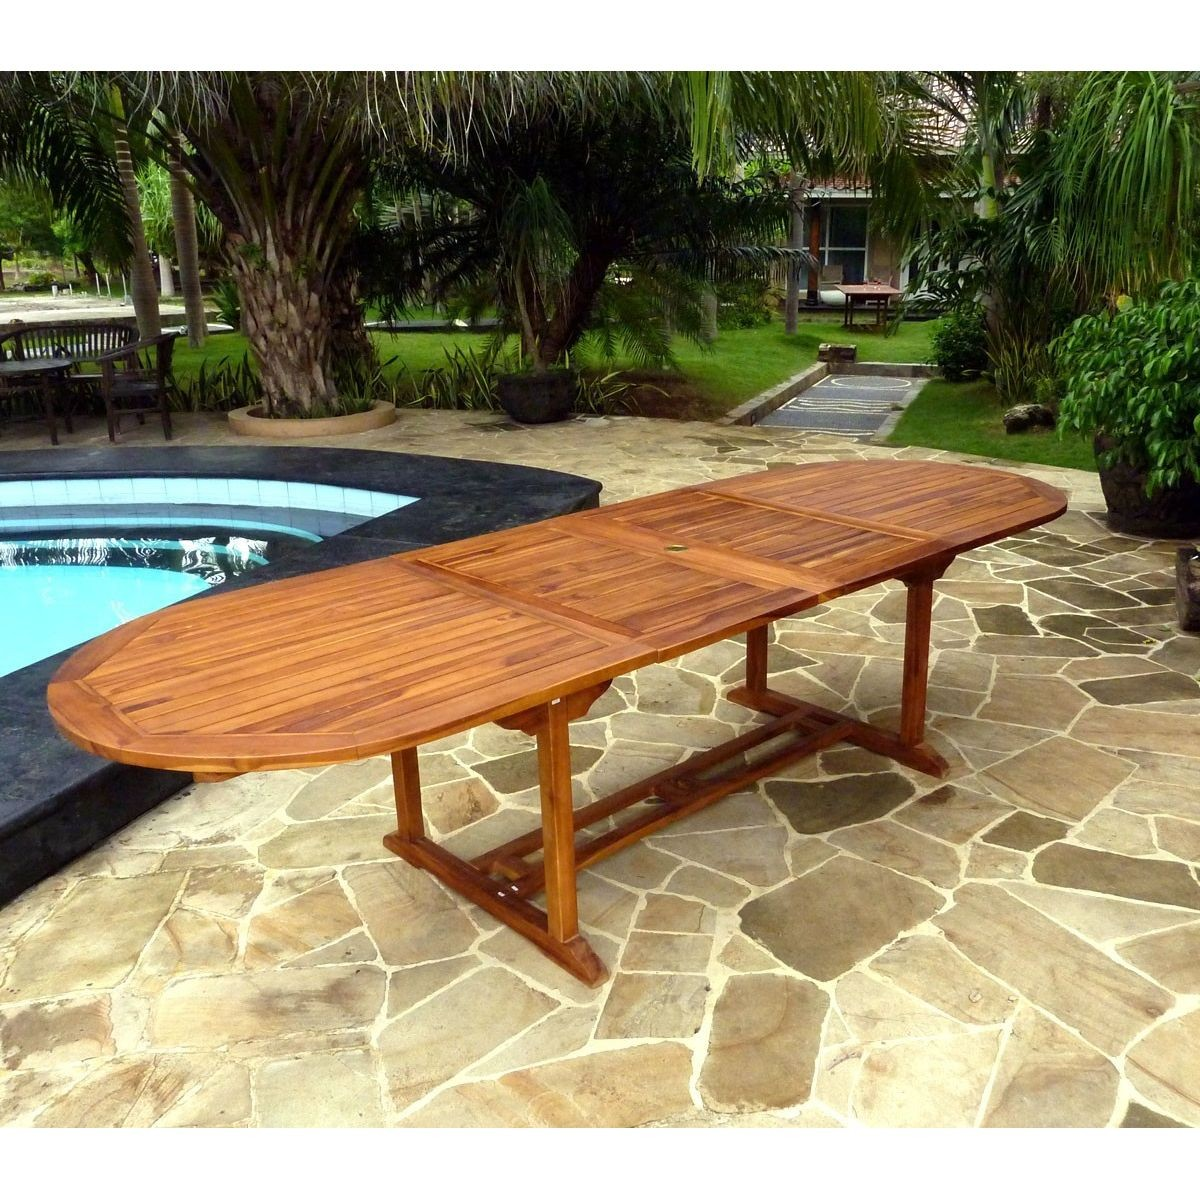 Table De Jardin En Teck Xxl 200-250-300 Cm Double Rallonge - Taille ...